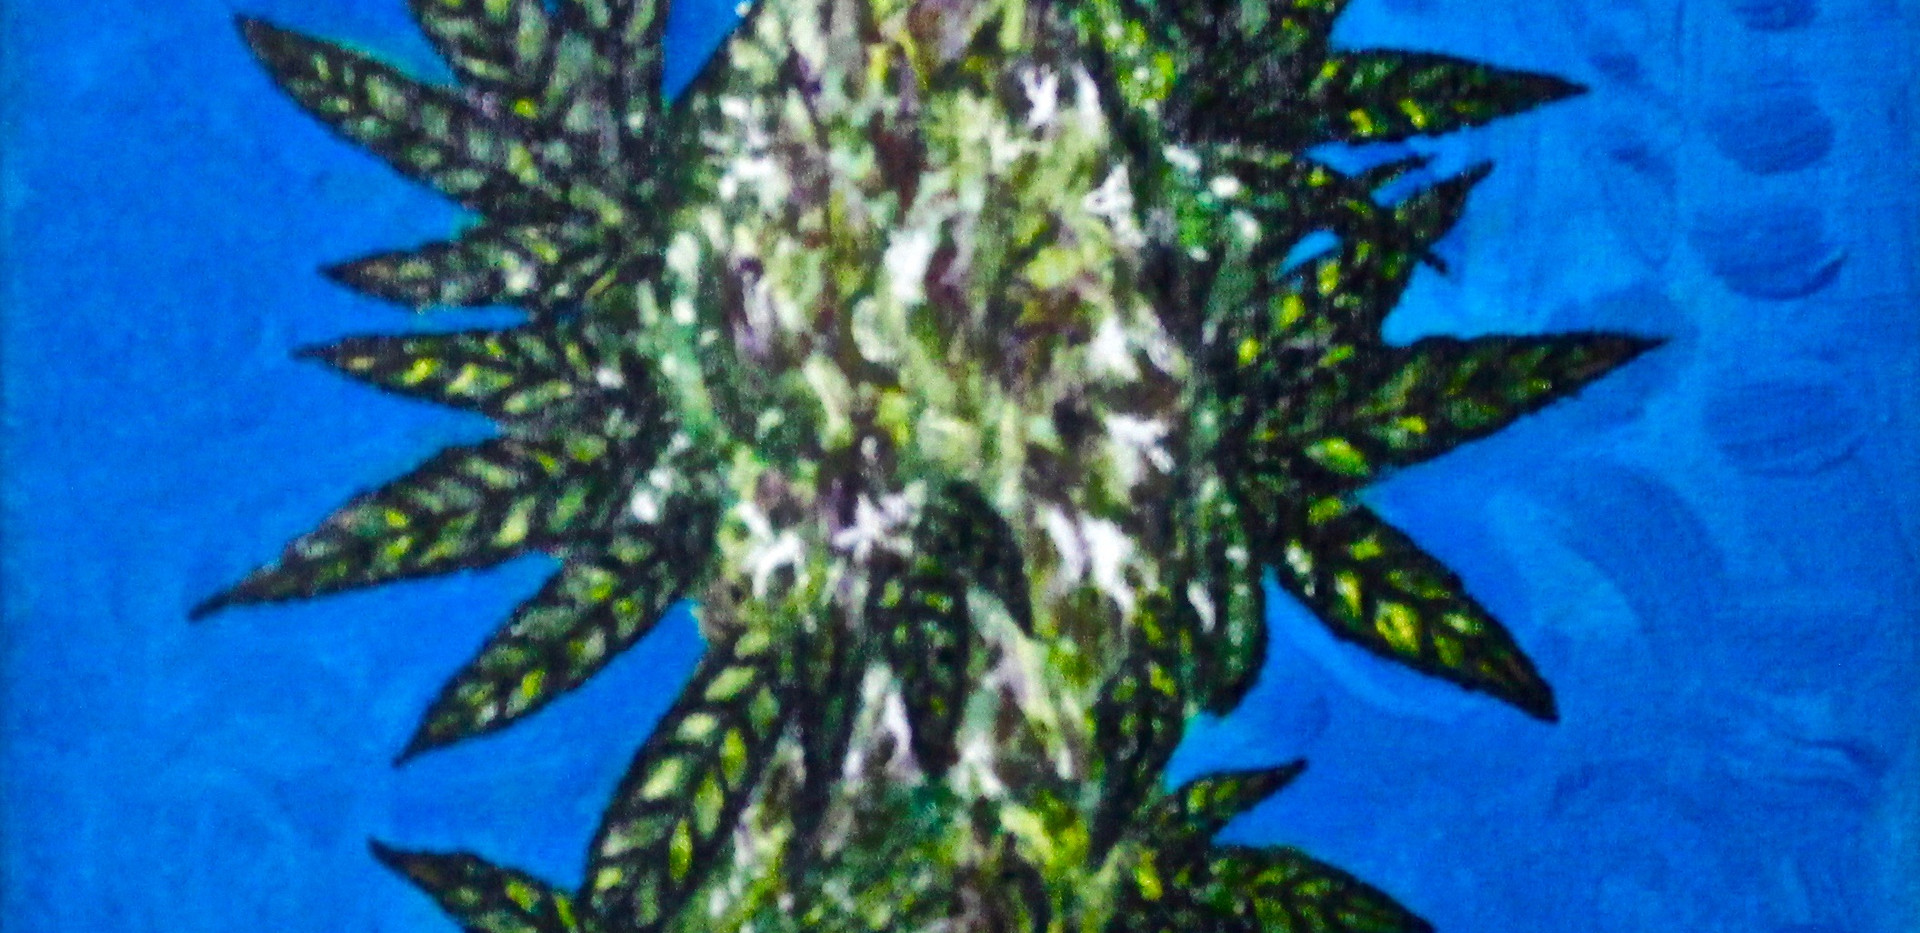 Purple Haze Cannabis.